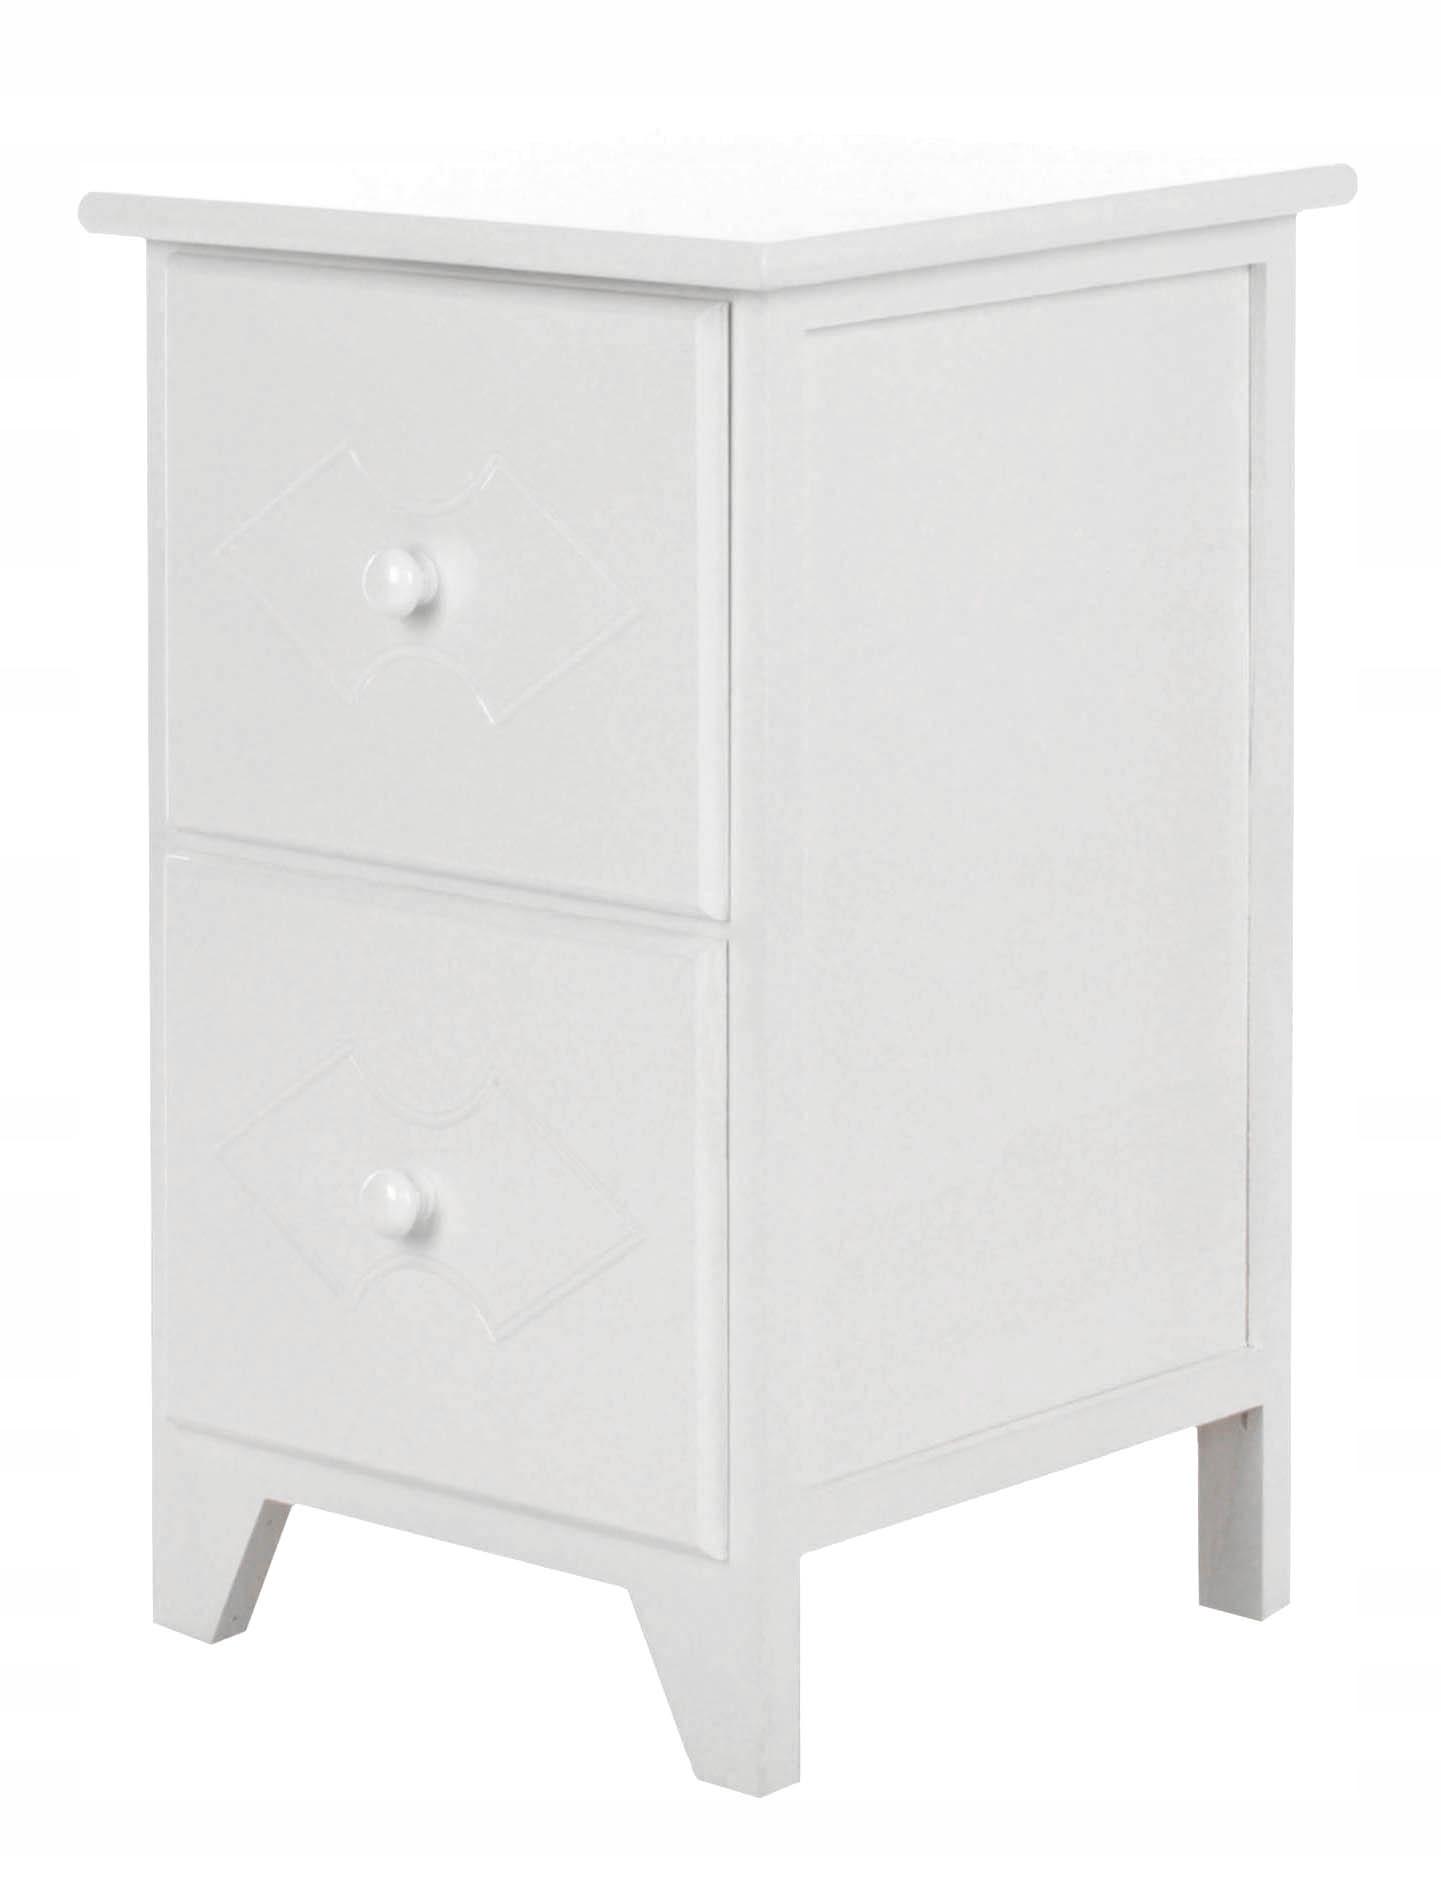 K27 nočnom stolíku NOČNÝ stolík toaletný stolík VINTAGE WHITE